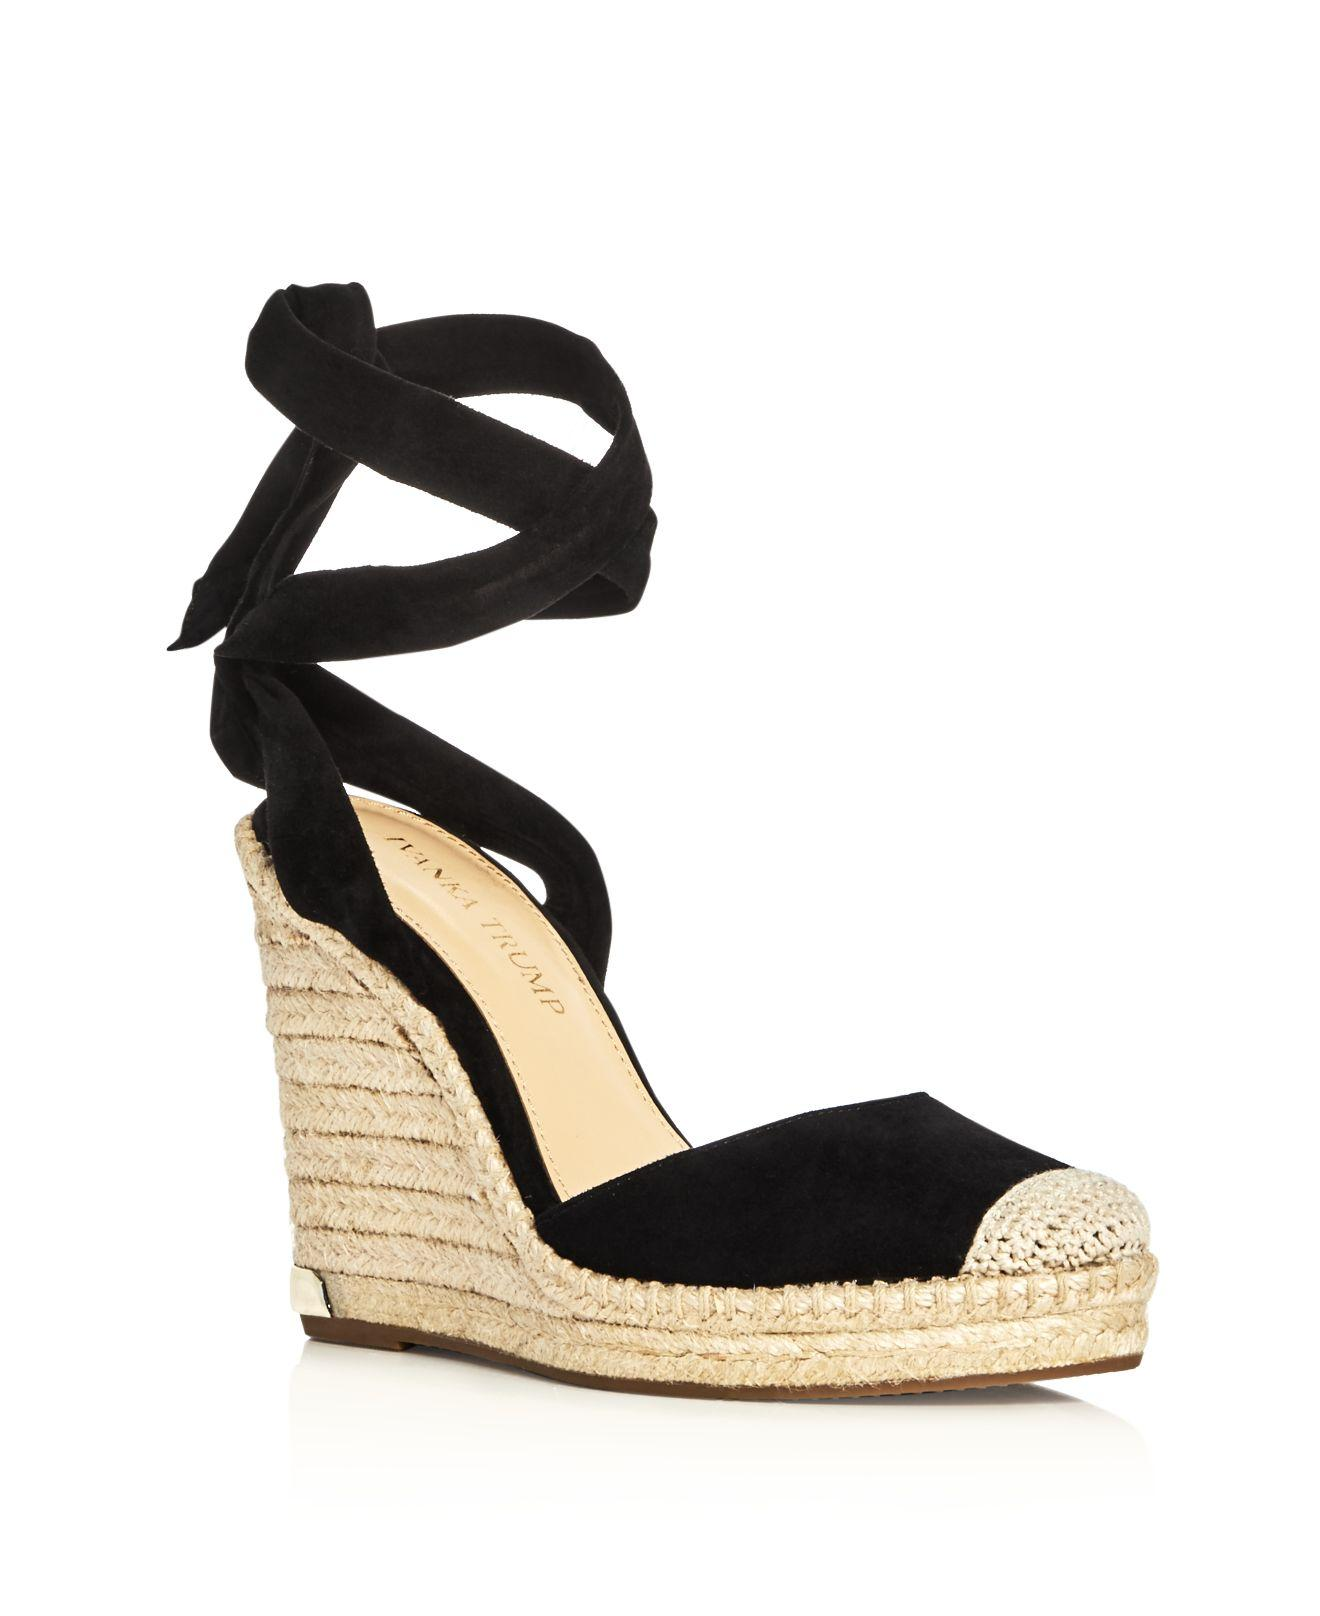 ivanka winikka ankle tie espadrille wedge sandals in